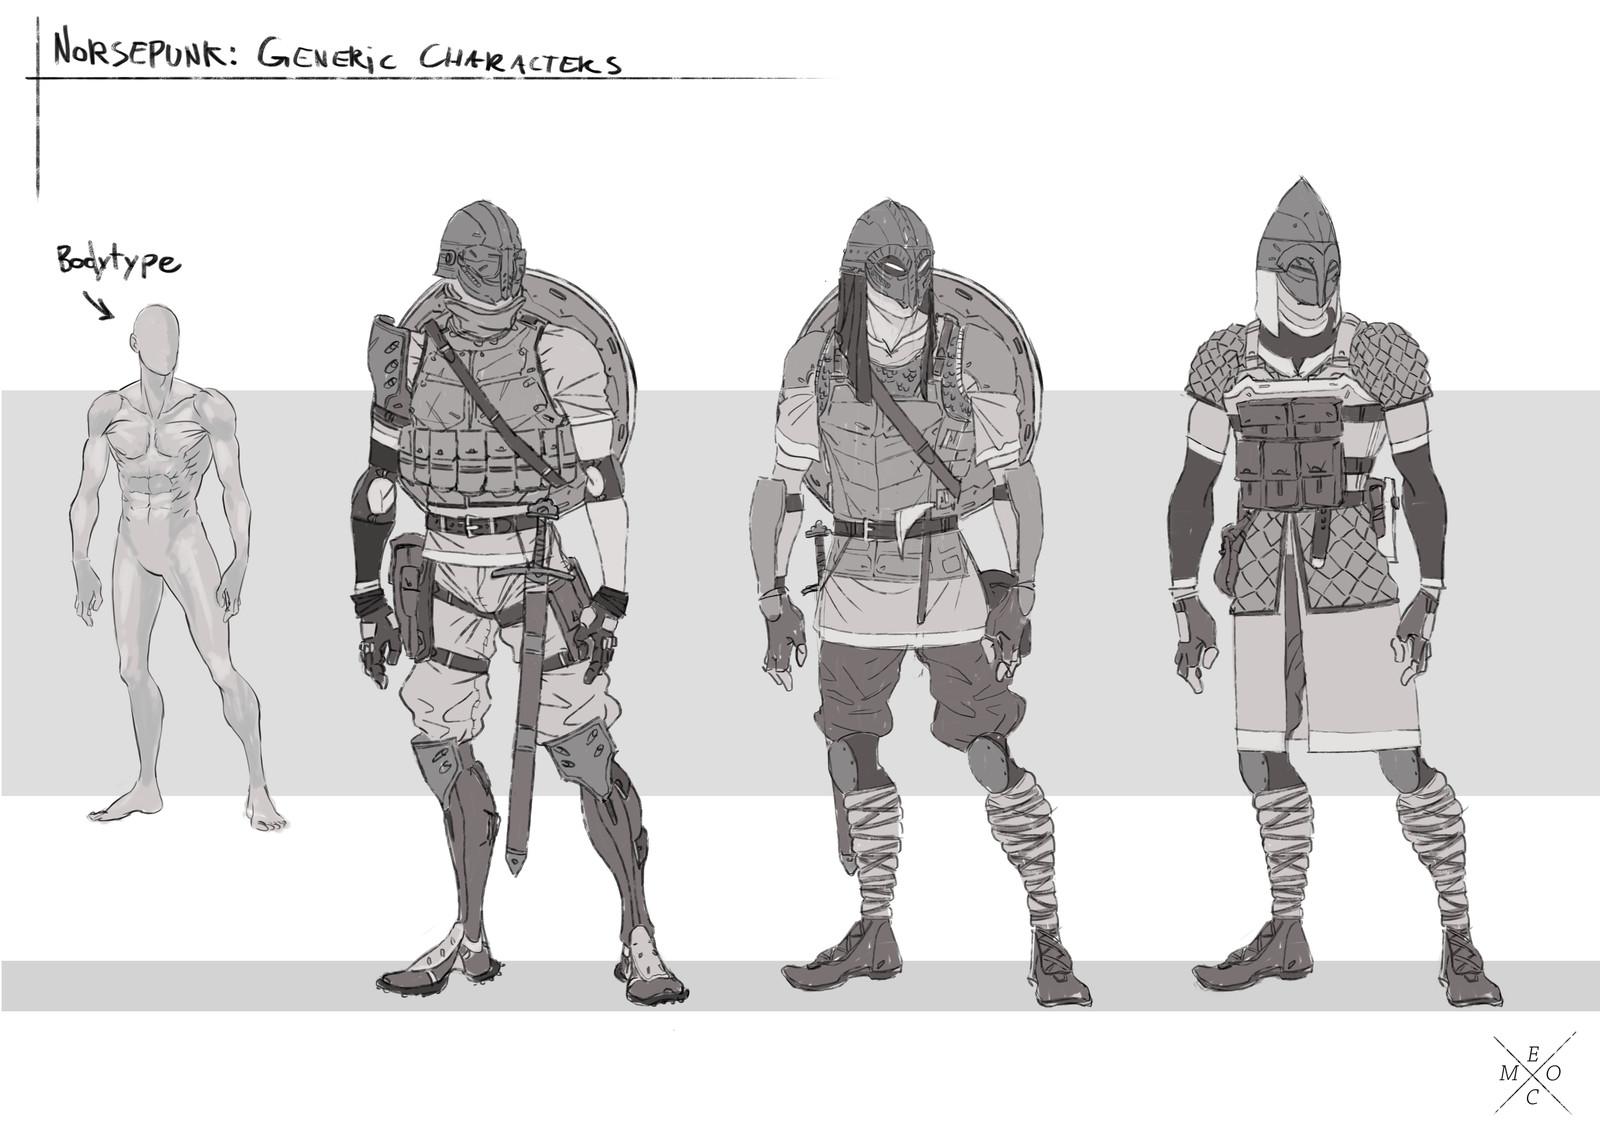 Norsepunk: Visual Development 01